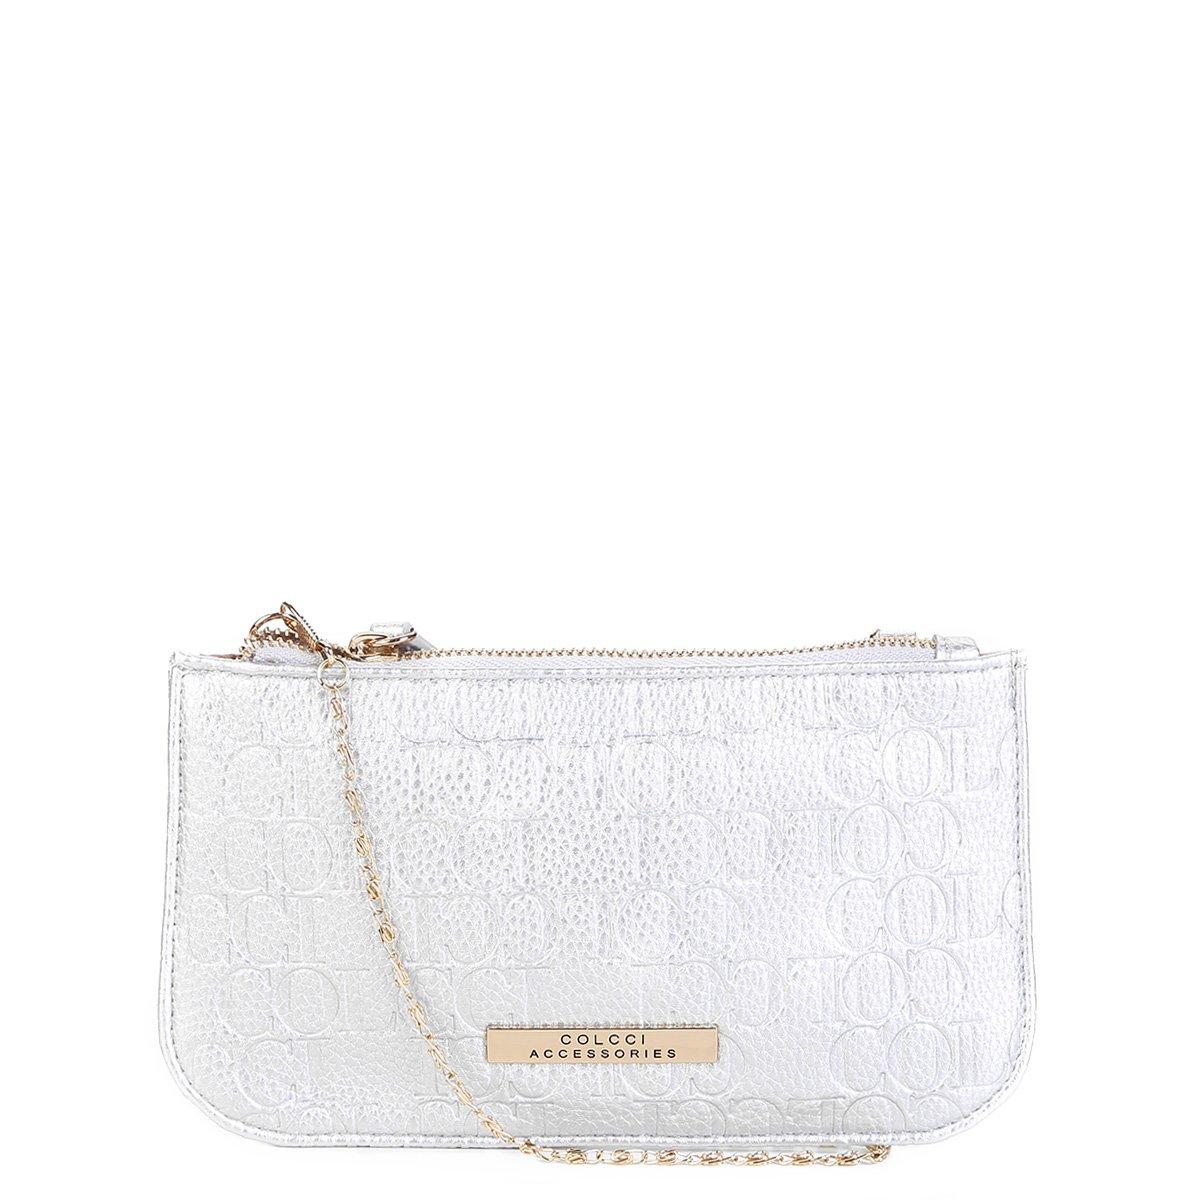 187e0d29c Bolsa Colcci Mini Bag Tiracolo Alça Corrente Placa Feminina